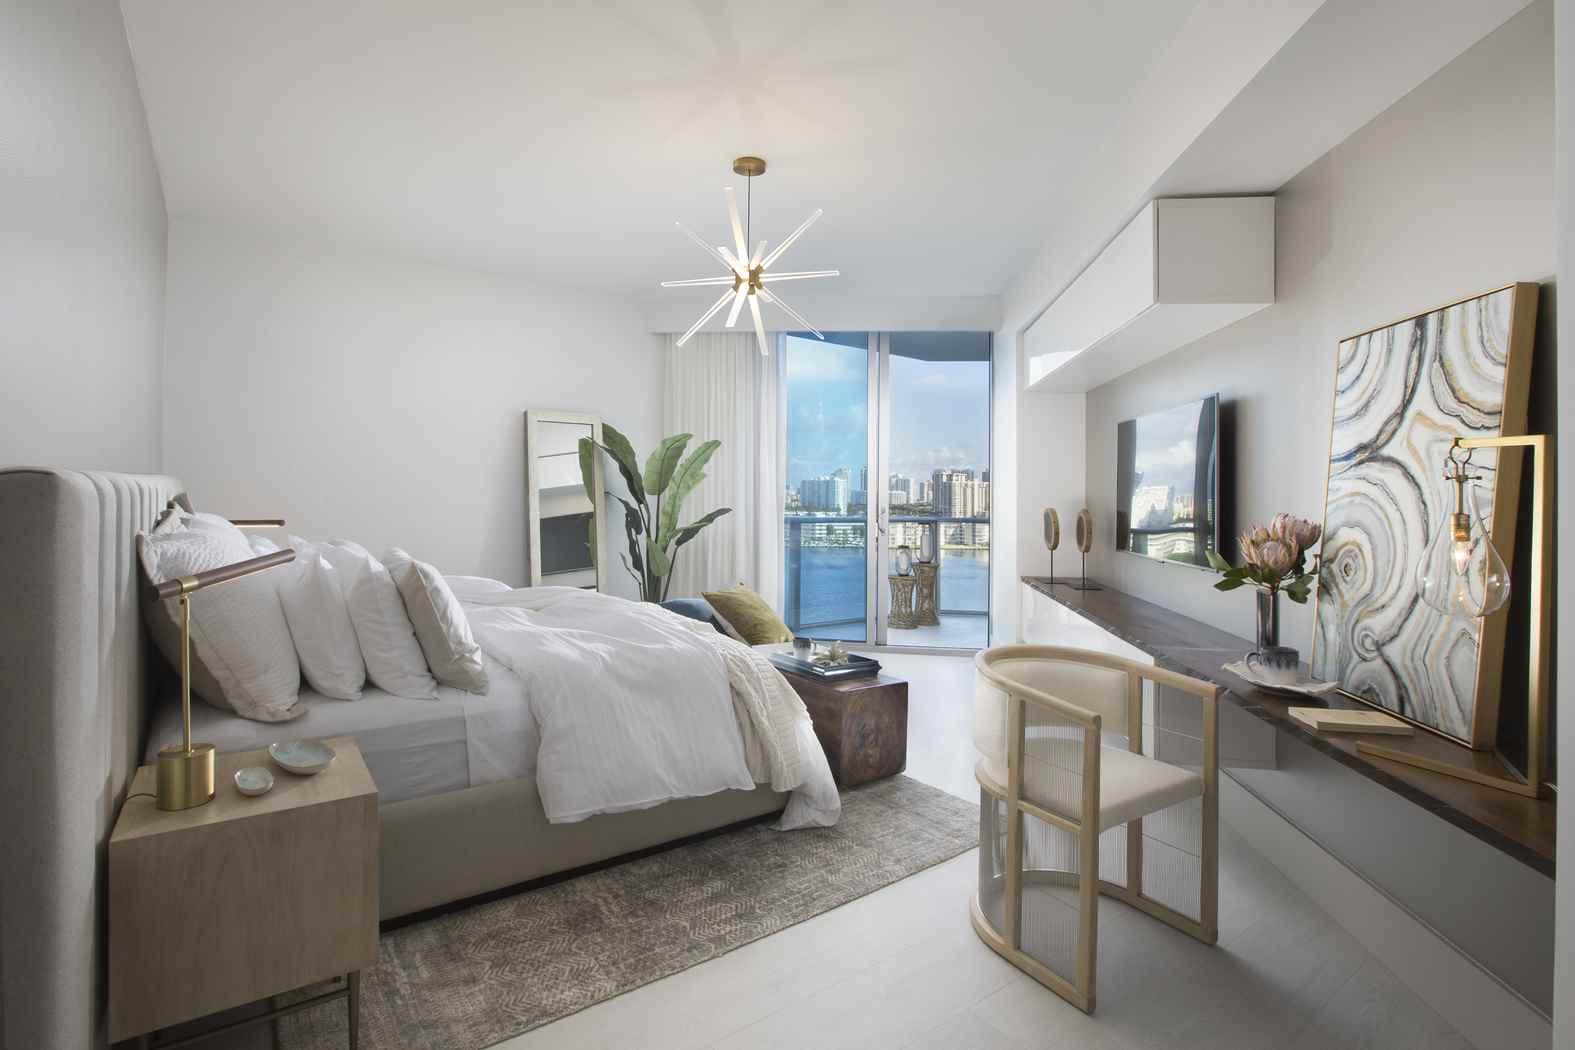 Apartment Decorating Services